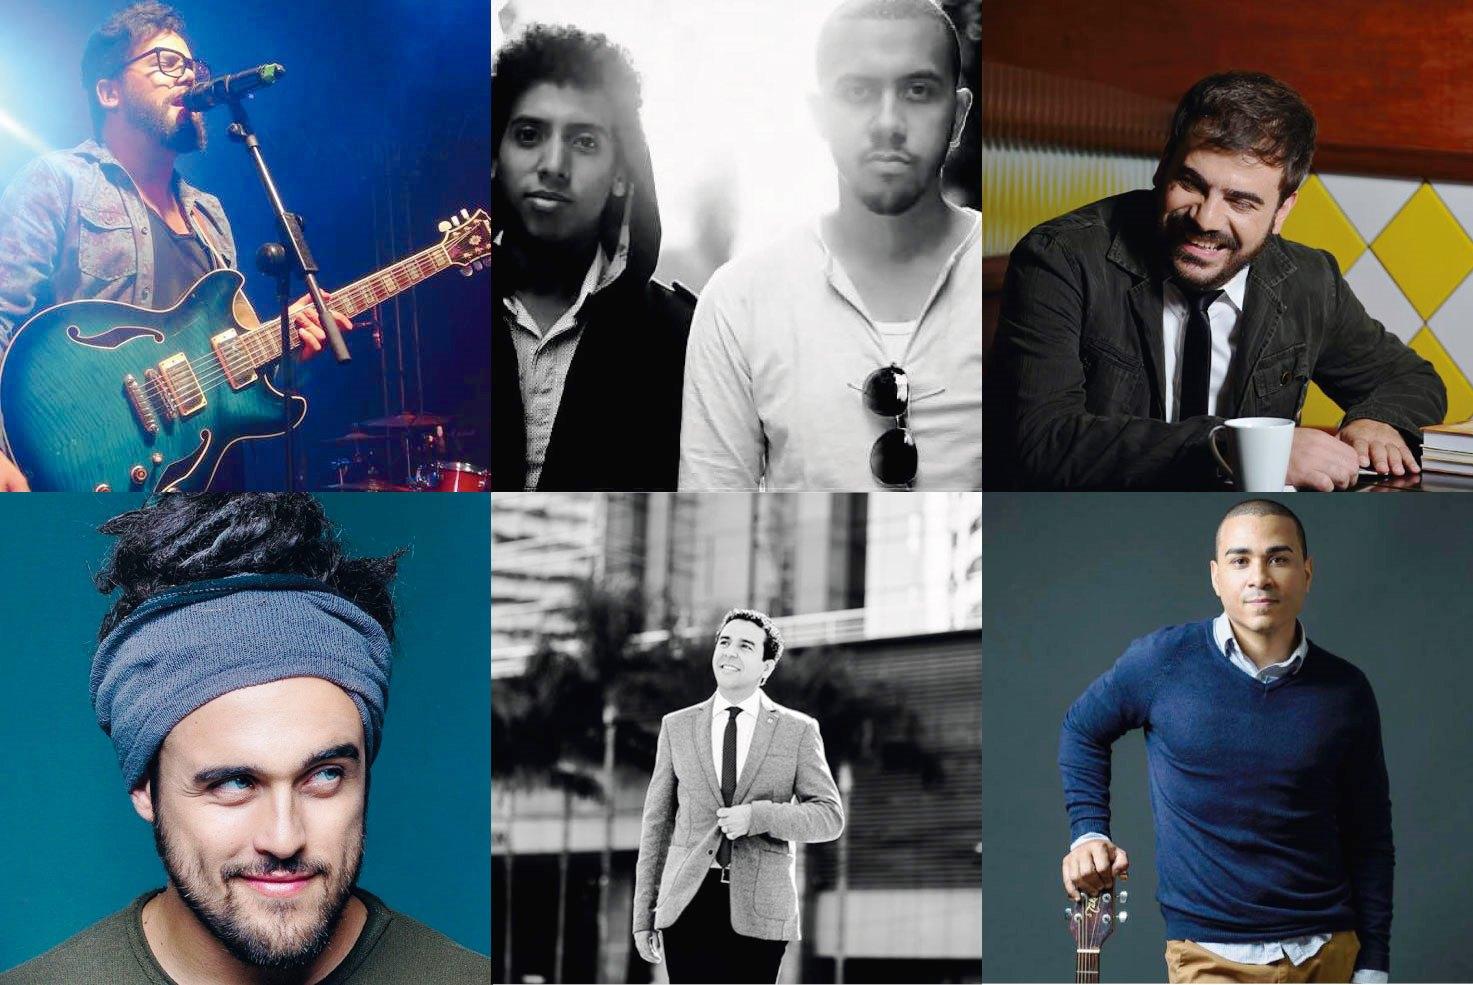 6 vozes masculinas para ouvir e compartilhar